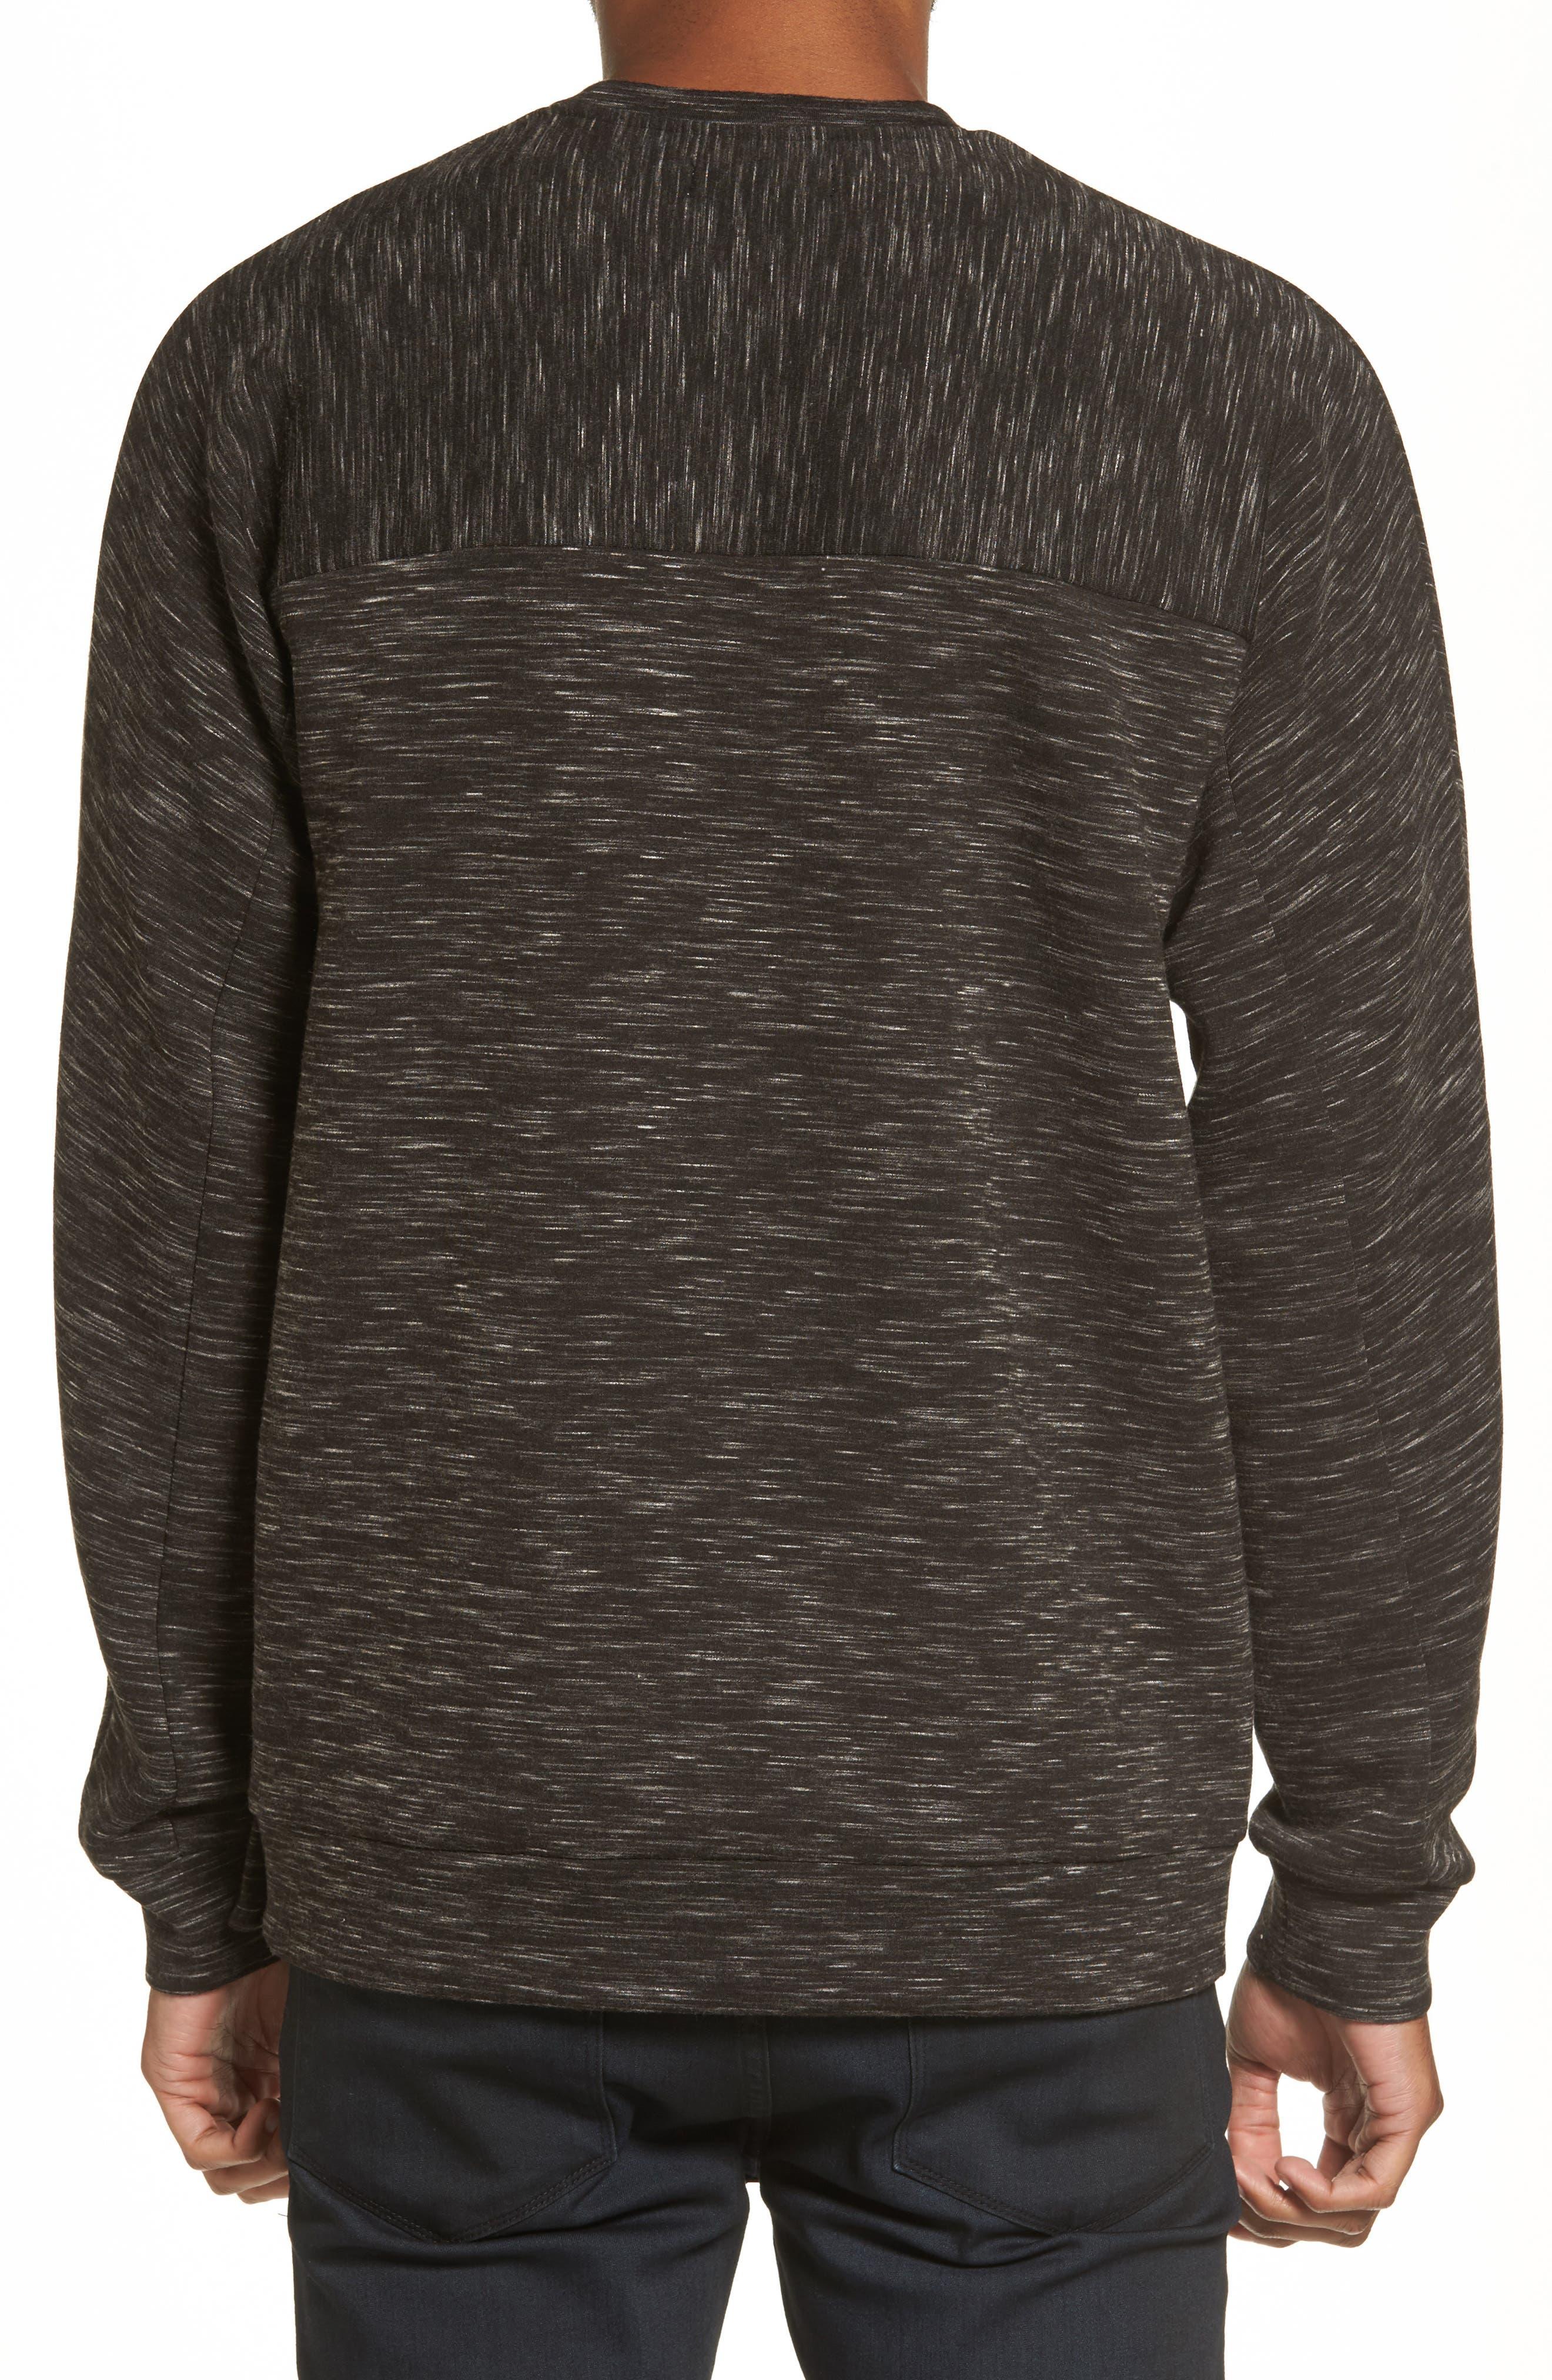 Alternate Image 2  - Calibrate Side Zip Crewneck Sweatshirt